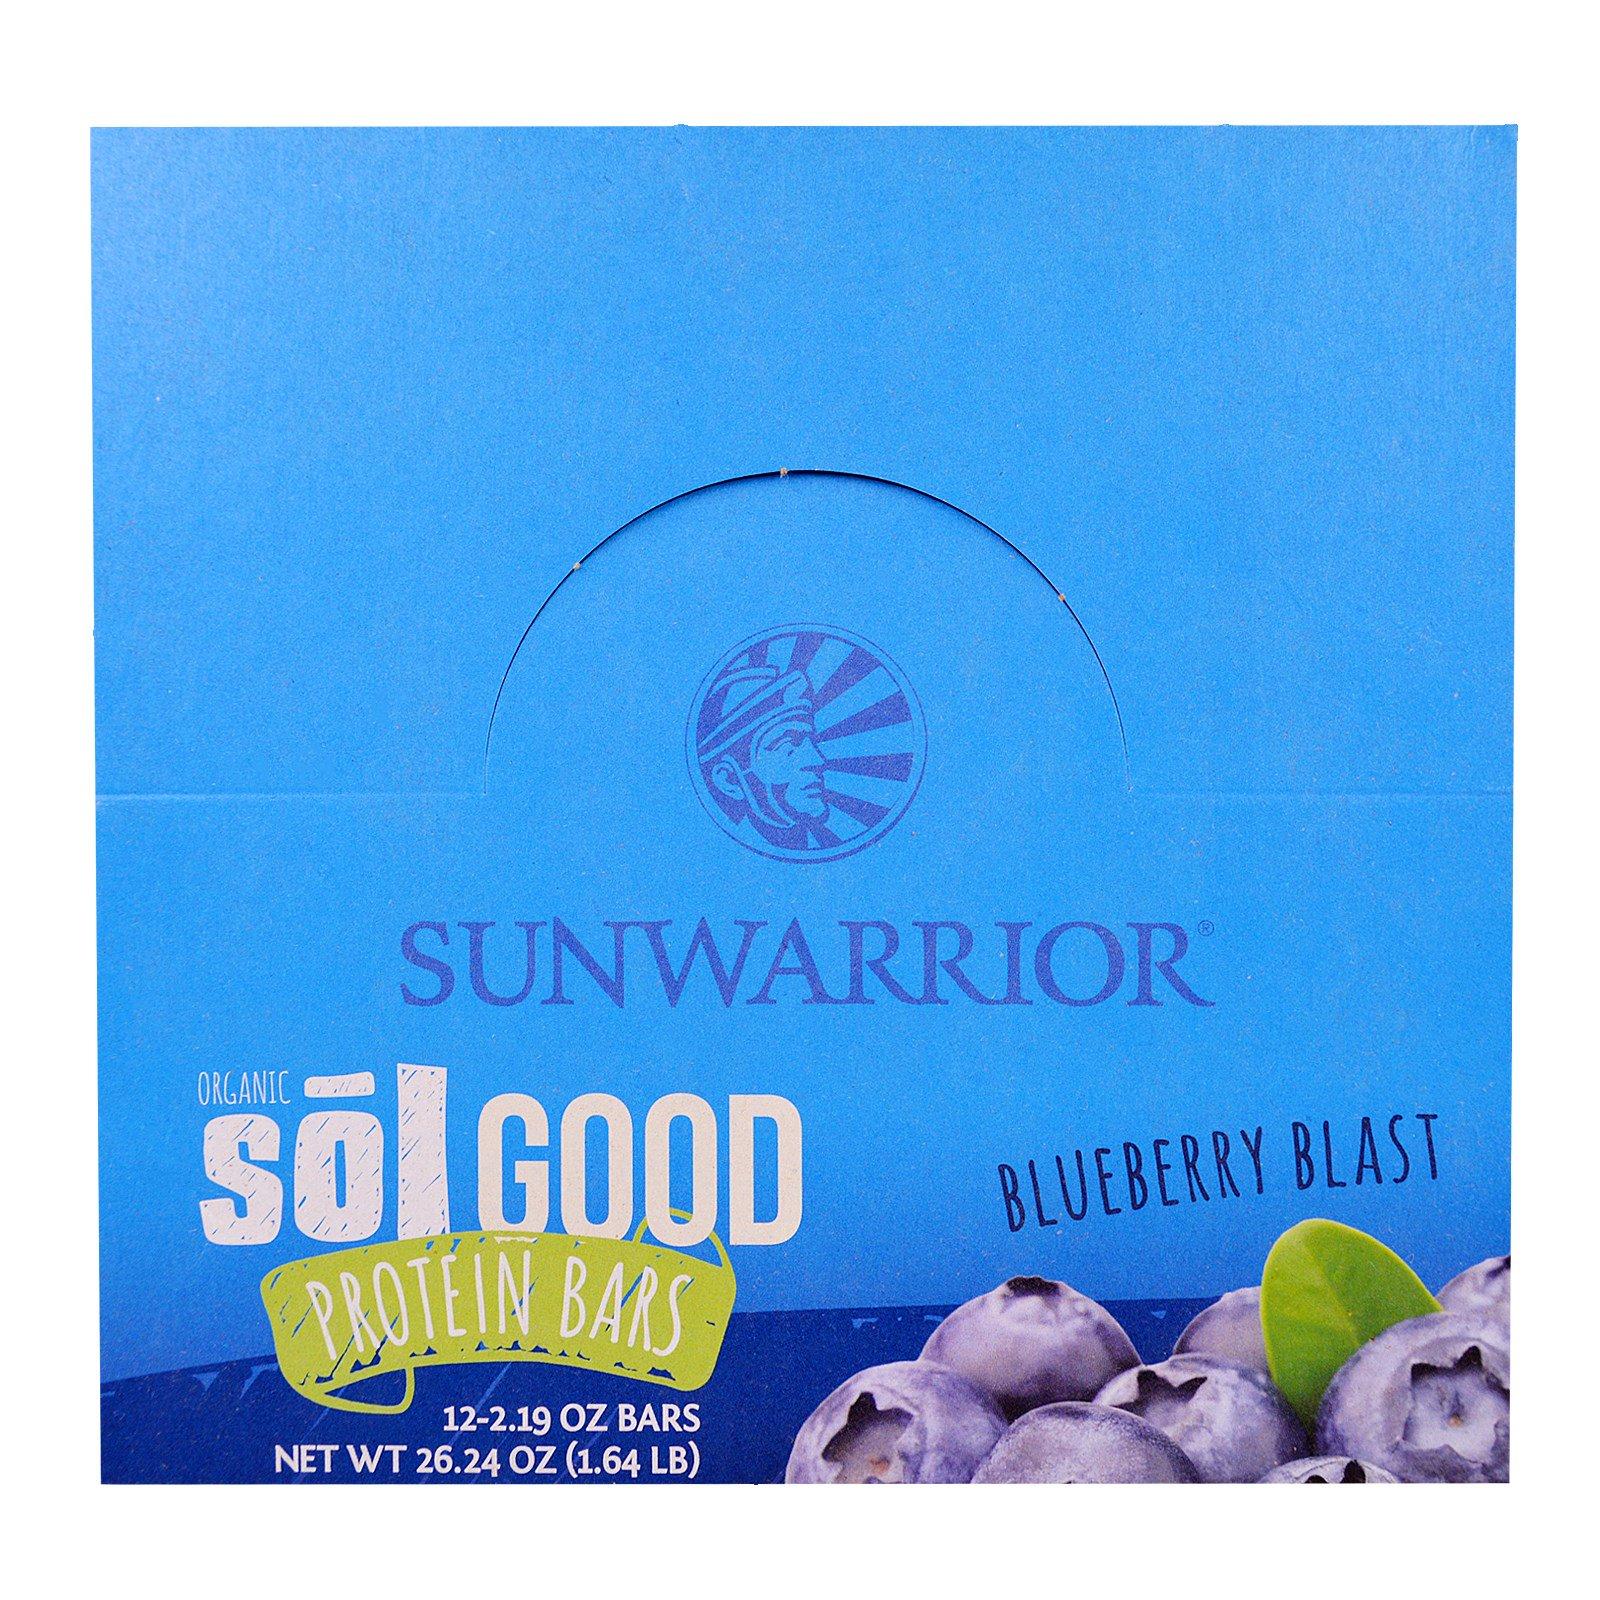 Sunwarrior, Organic Sol Good Protein Bars, Blueberry Blast, 12 Bars, 2.19 Oz